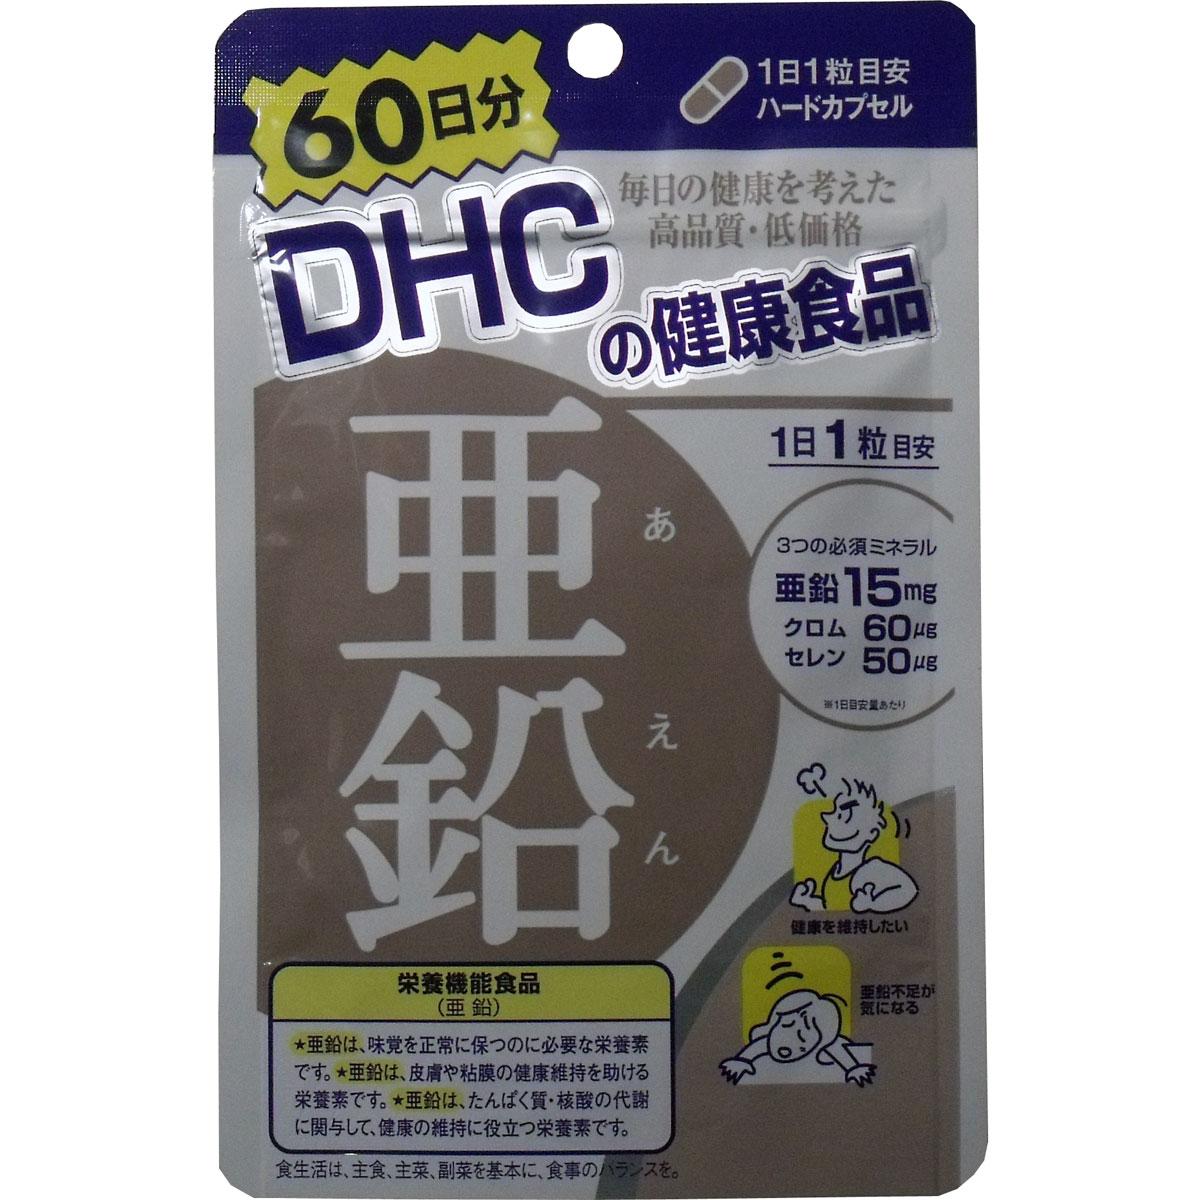 DHC 營養補給品 活力鋅元素 60日份(60粒)